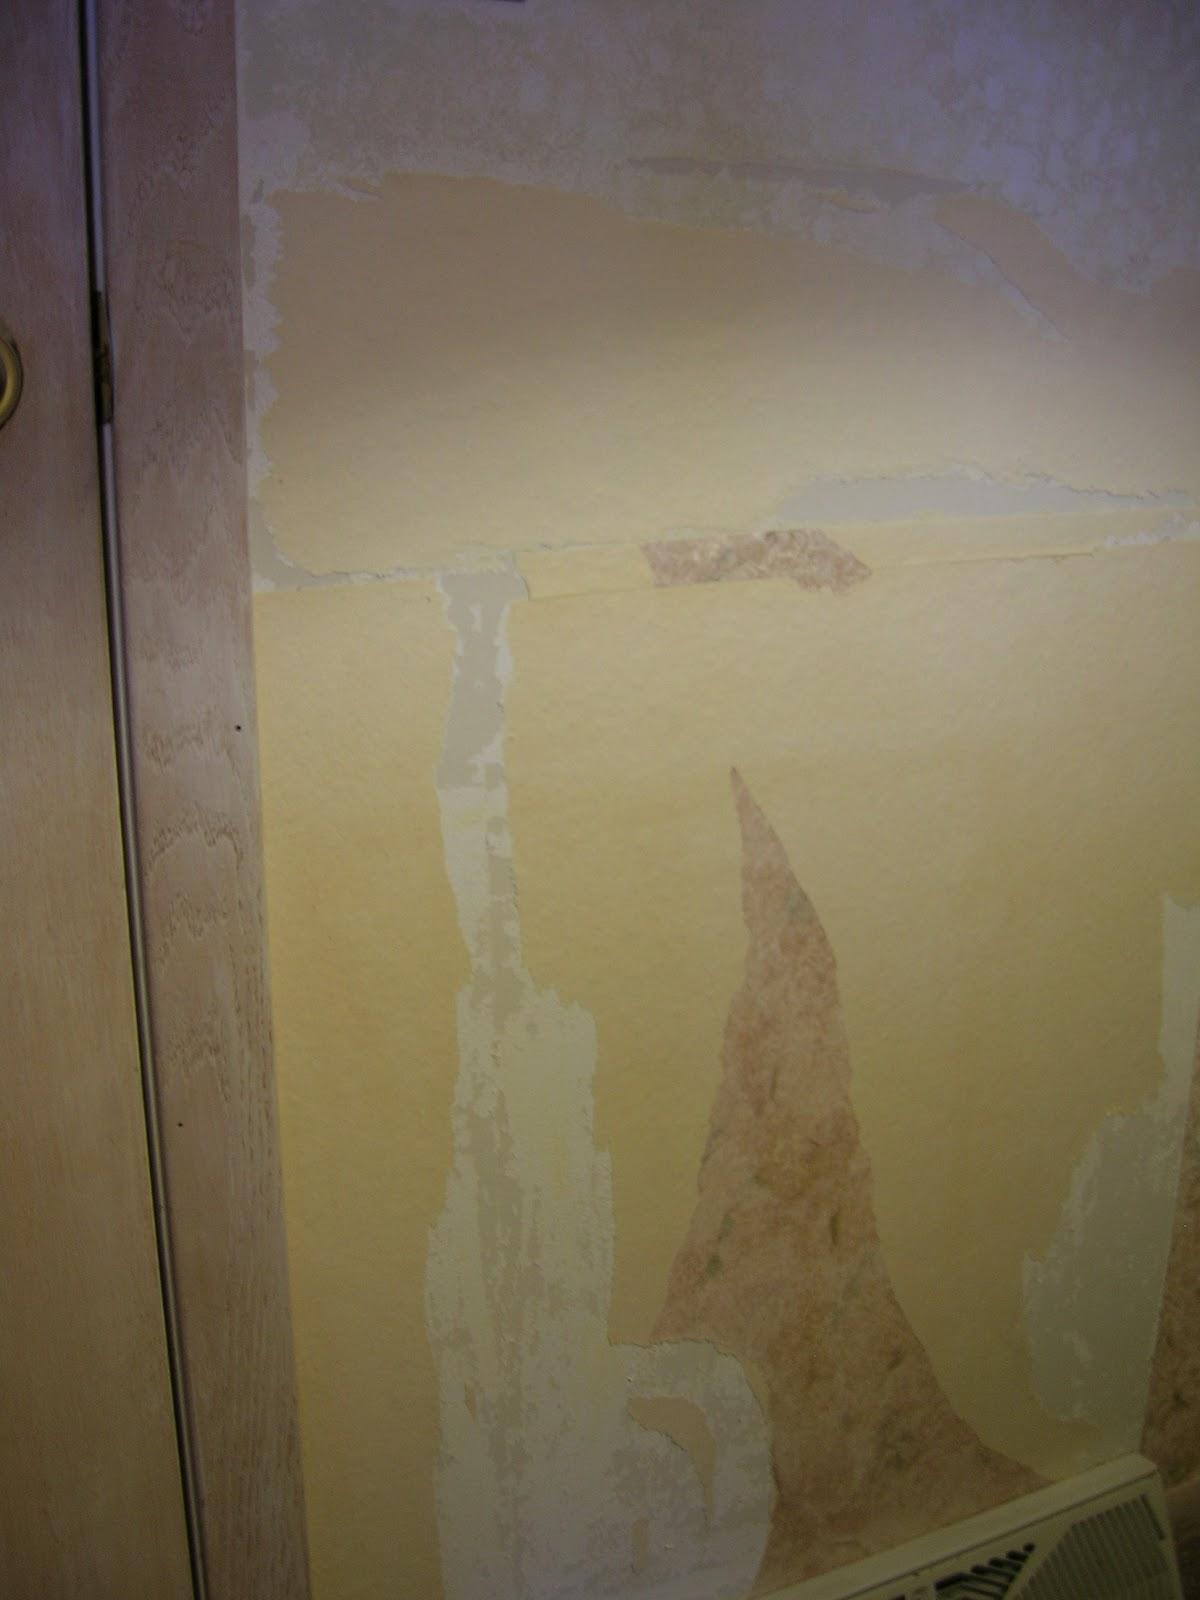 http://1.bp.blogspot.com/-RntbzW9jXYg/T242WbMpiHI/AAAAAAAAGws/Z3VkslKImGk/s1600/family+room+redo+removing+wallpaper+004.JPG